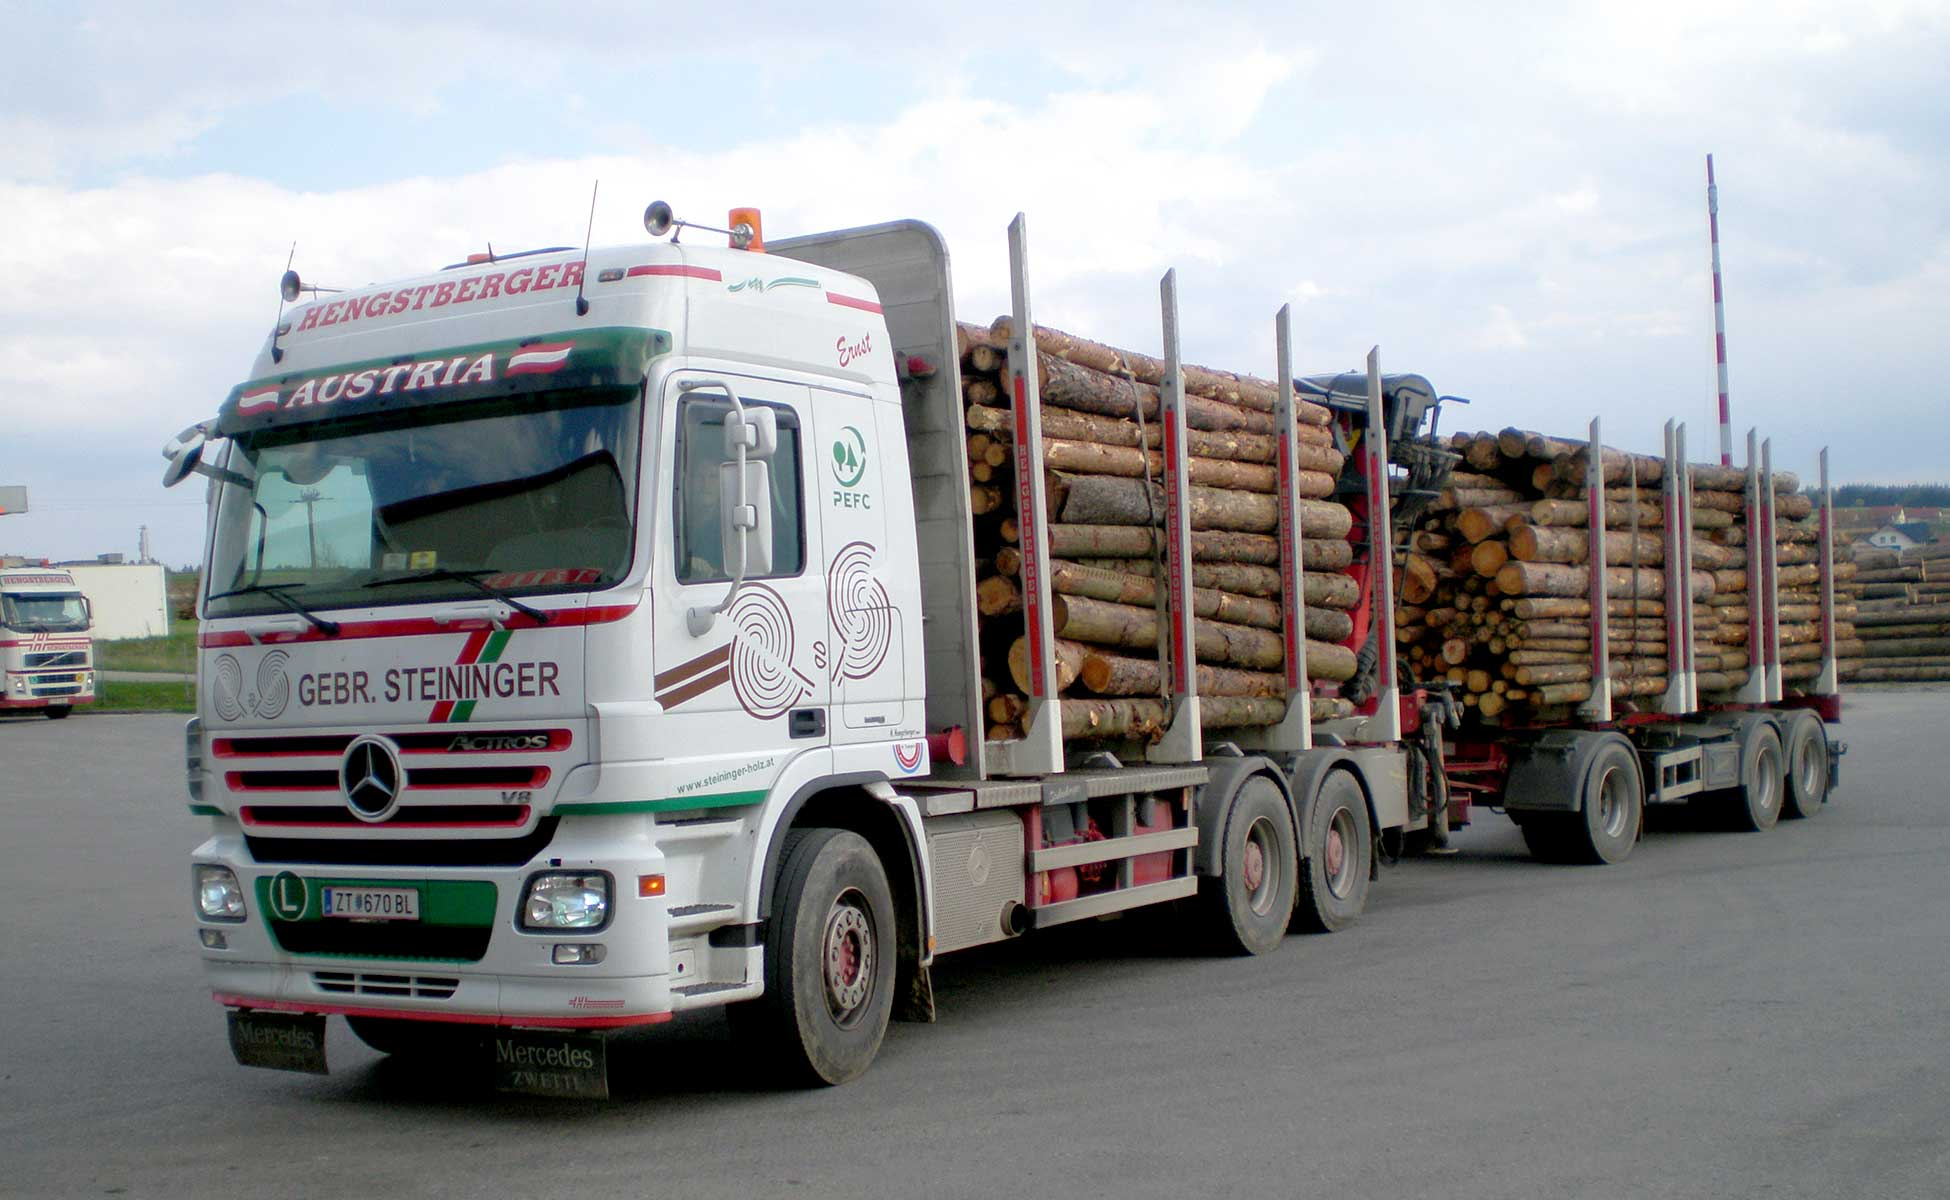 Hengstberger Holztransporte Schleifholz